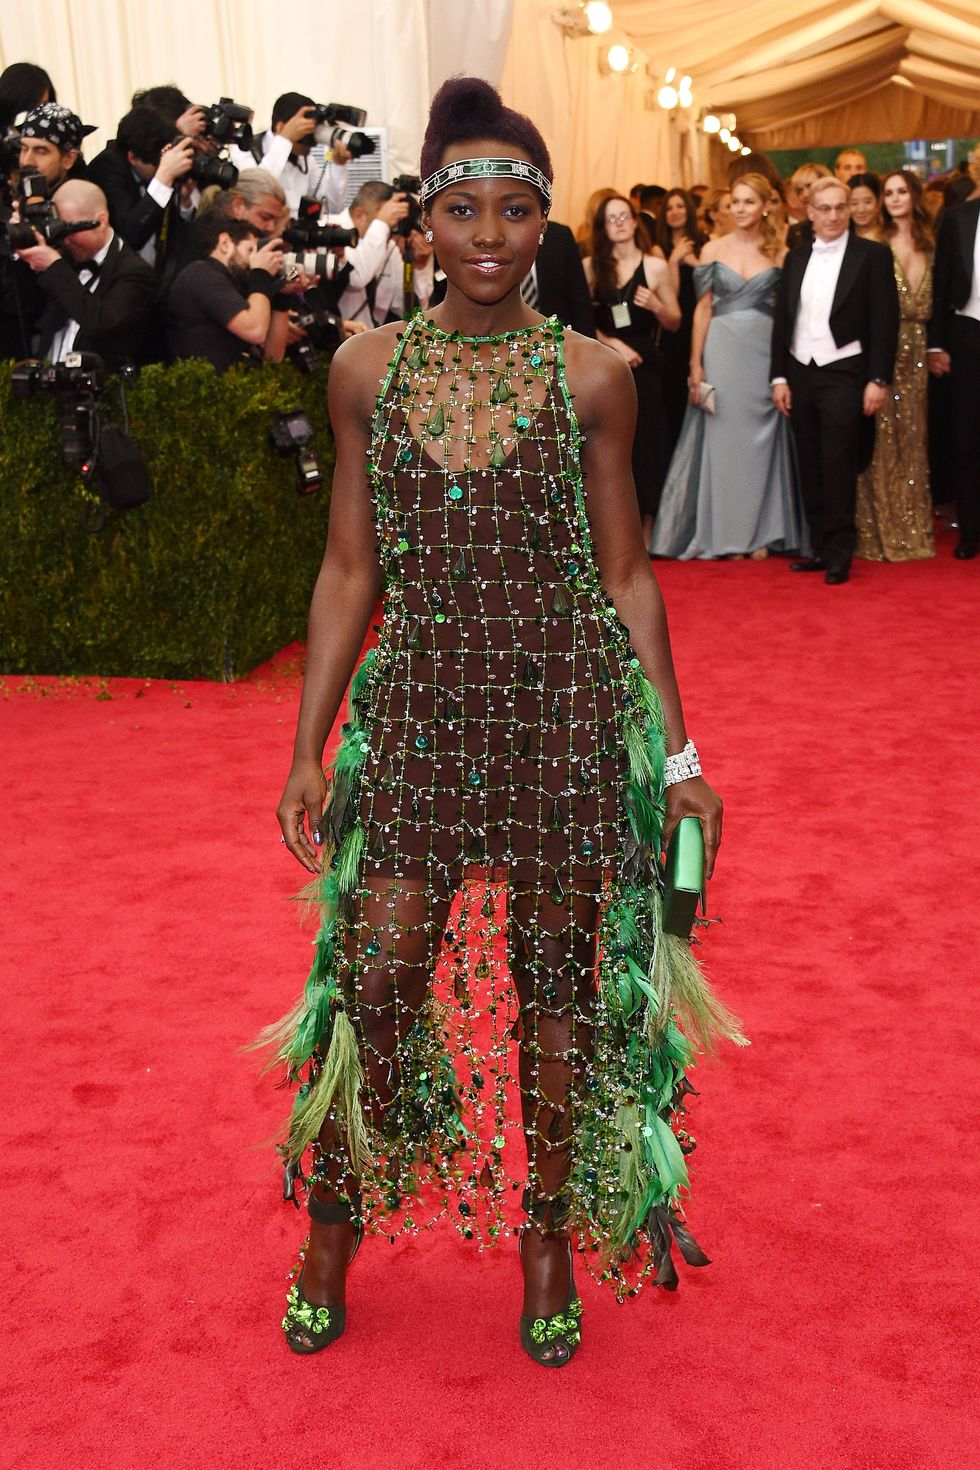 Лупита Нионго (Lupita Nyong'o) в платье с бахромой от Prada